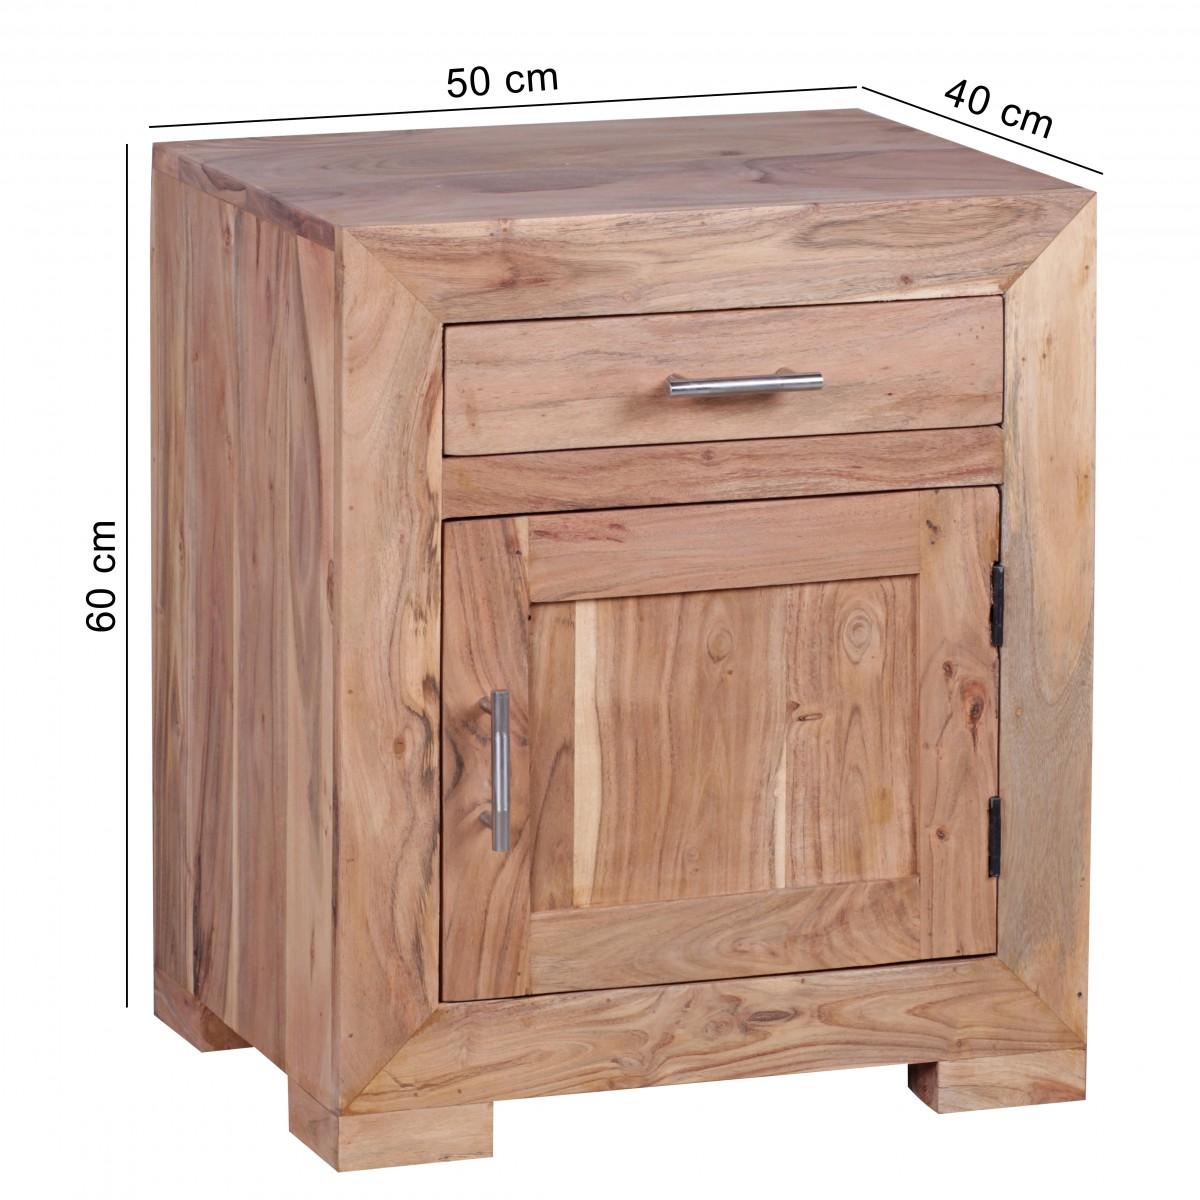 wohnling nachttisch mumbai massivholz akazie design. Black Bedroom Furniture Sets. Home Design Ideas